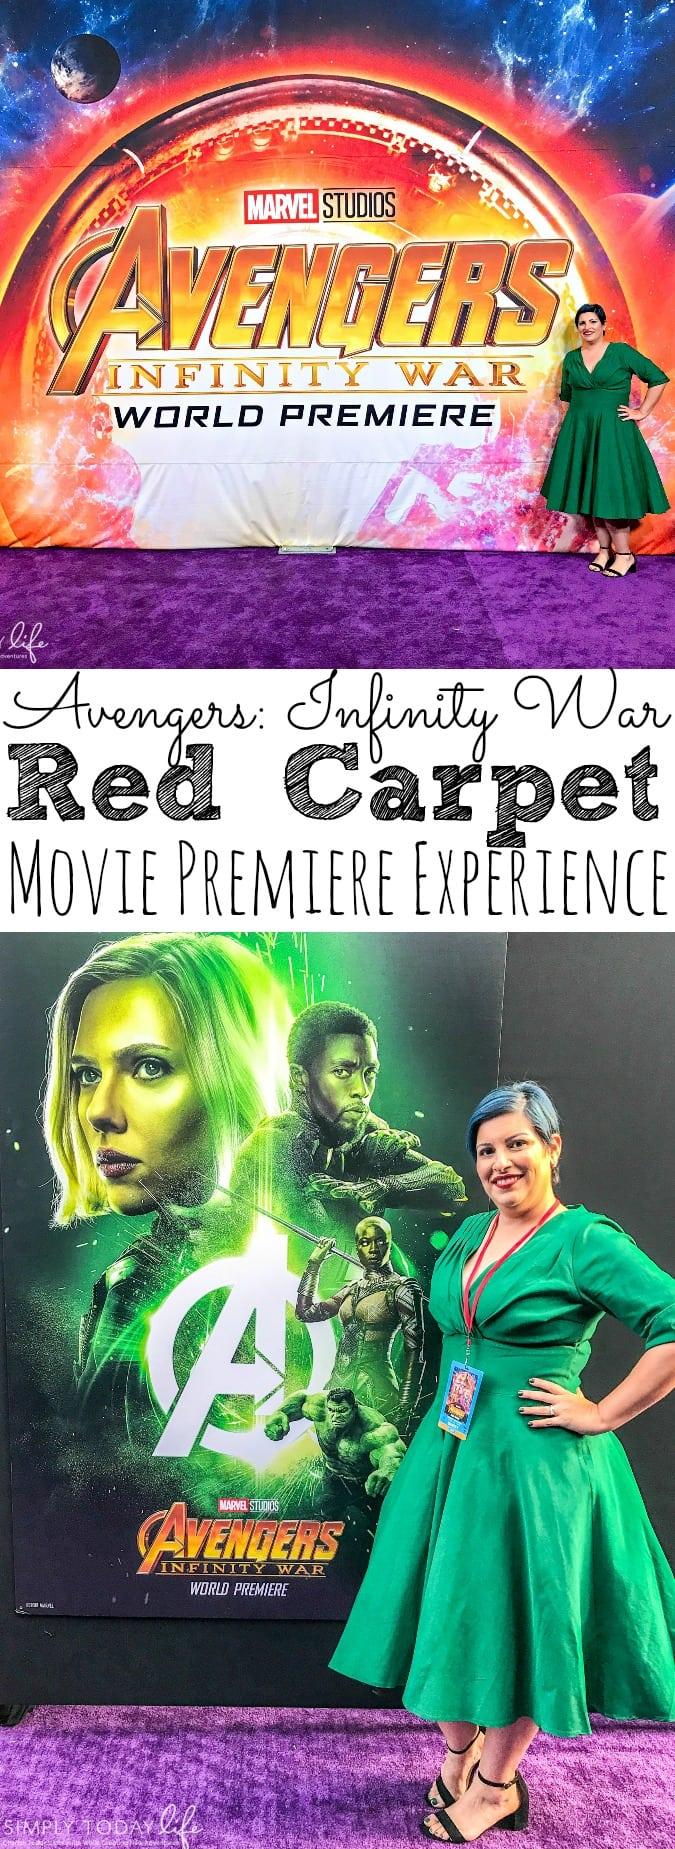 Avengers Infinity War Movie Premiere